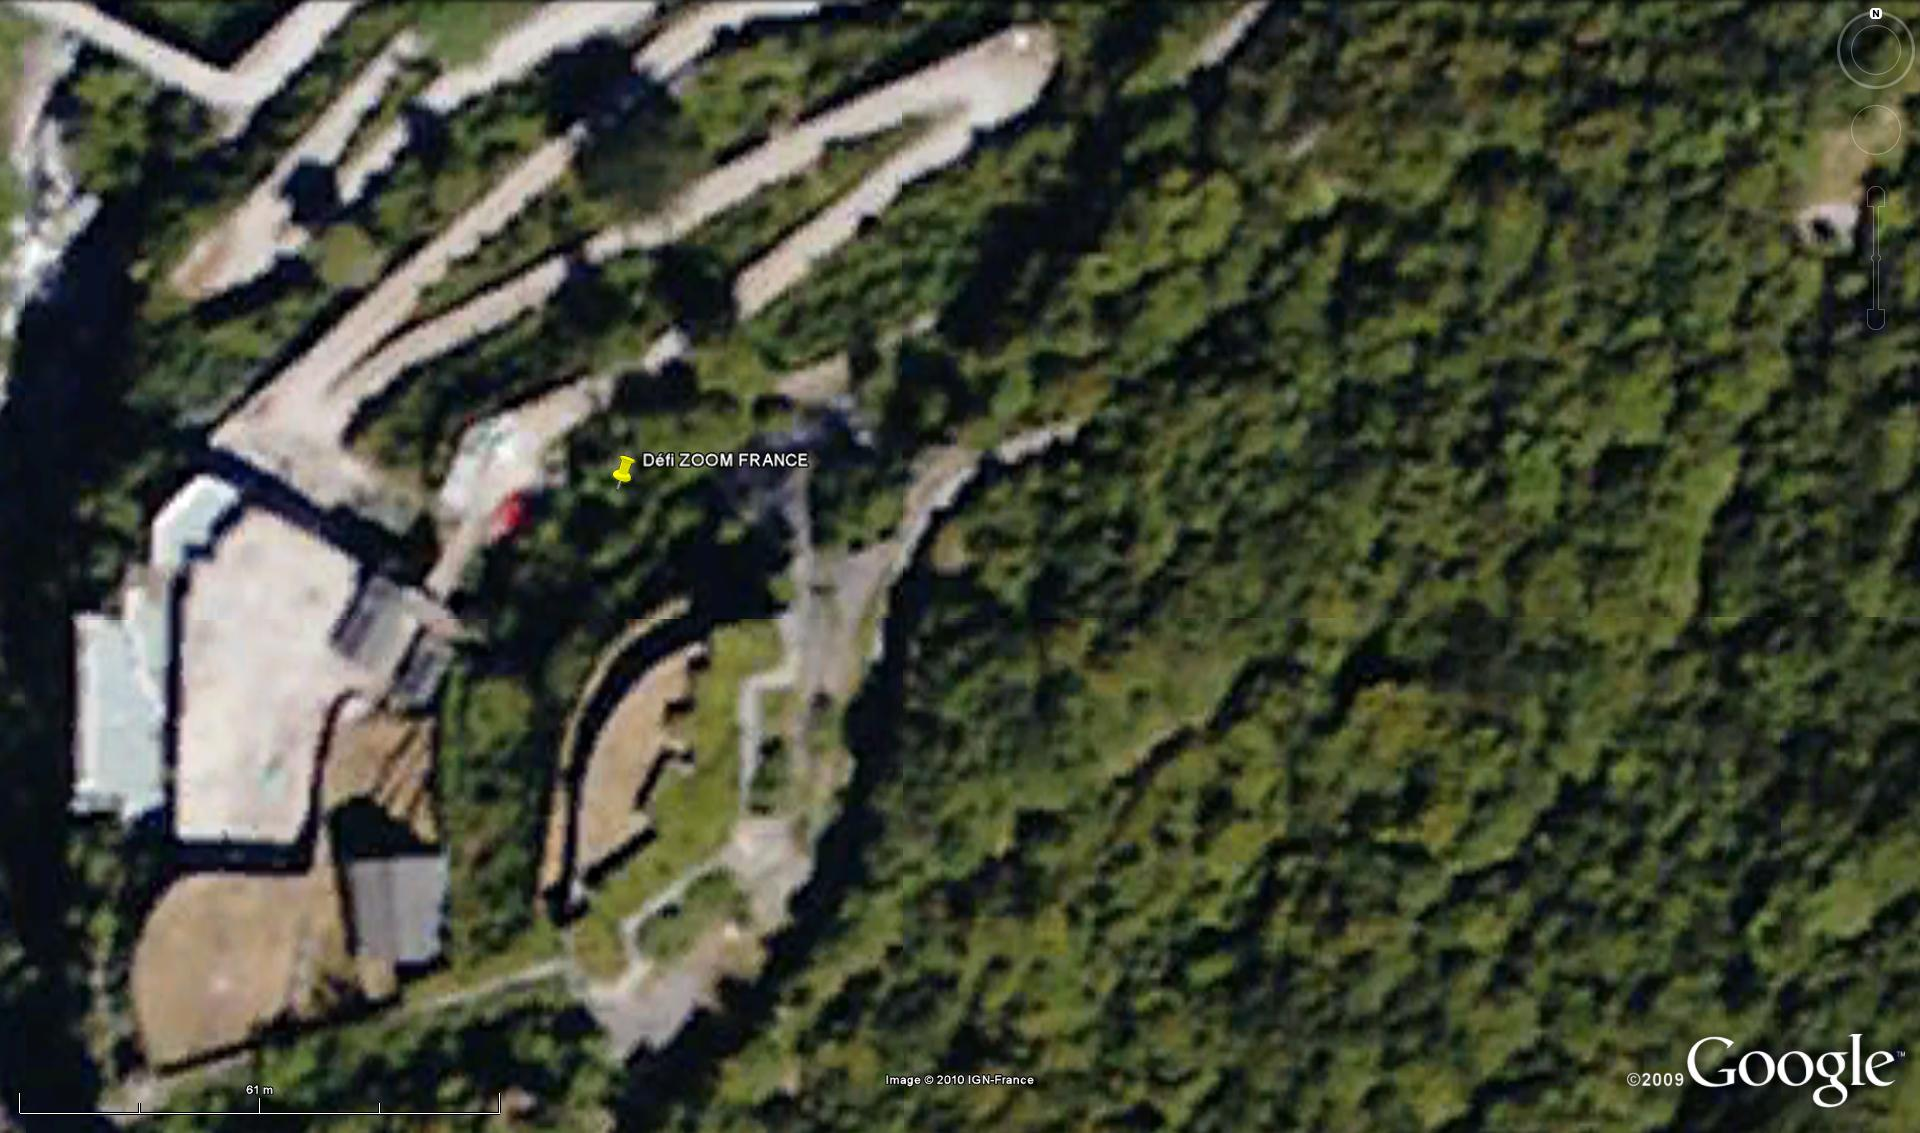 DEFIS ZOOM FRANCE 66 à 87 (Mai/Septembre 2010) - Page 62 Dafi_z19